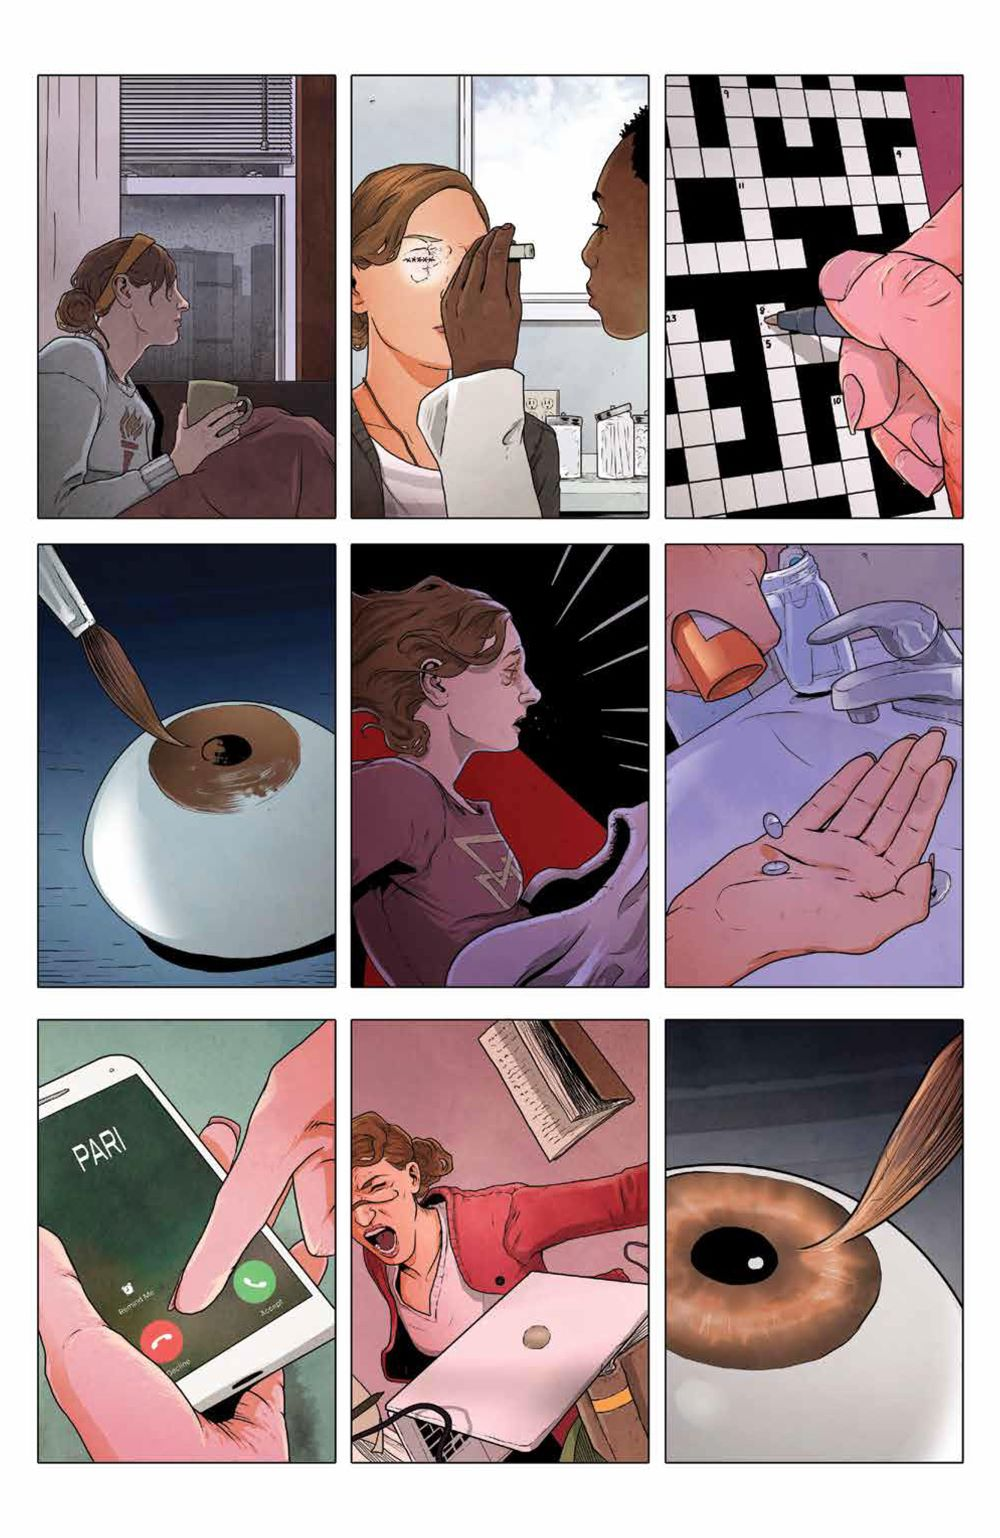 RedMother_v1_SC_PRESS_20 ComicList Previews: RED MOTHER VOLUME 1 TP